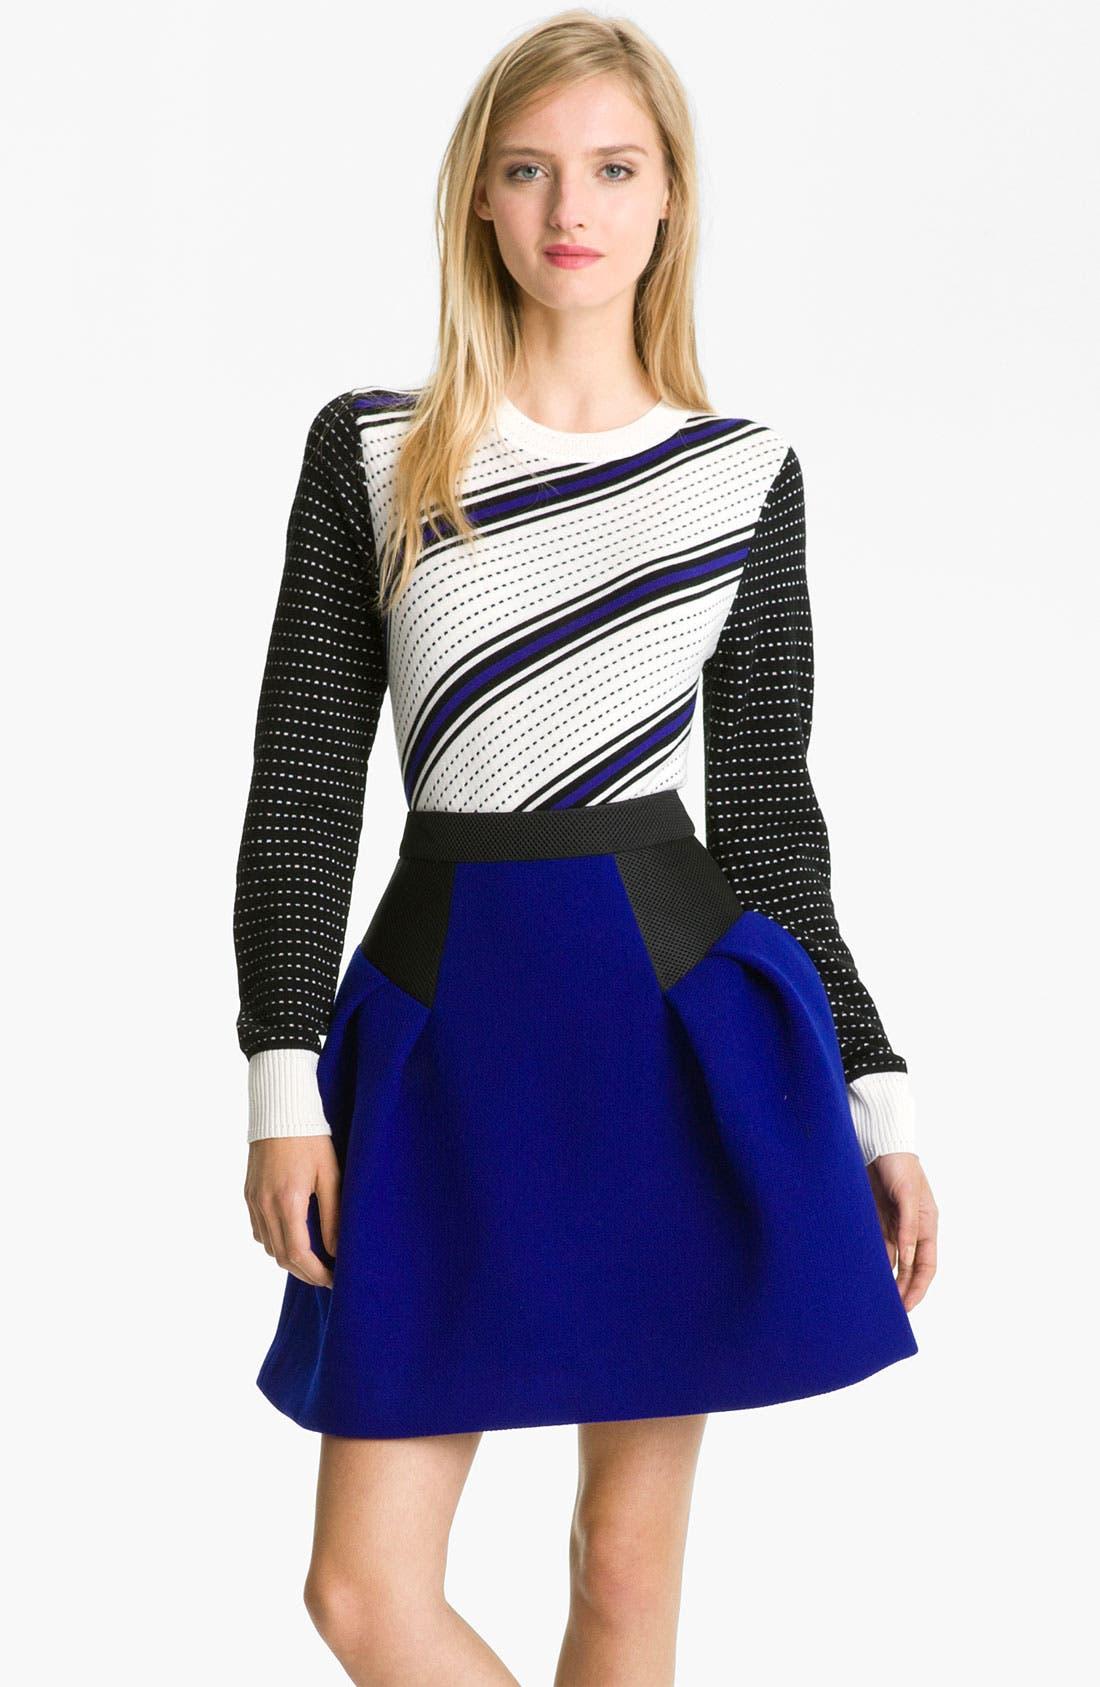 Alternate Image 1 Selected - Milly 'Dakota' Merino Wool Sweater